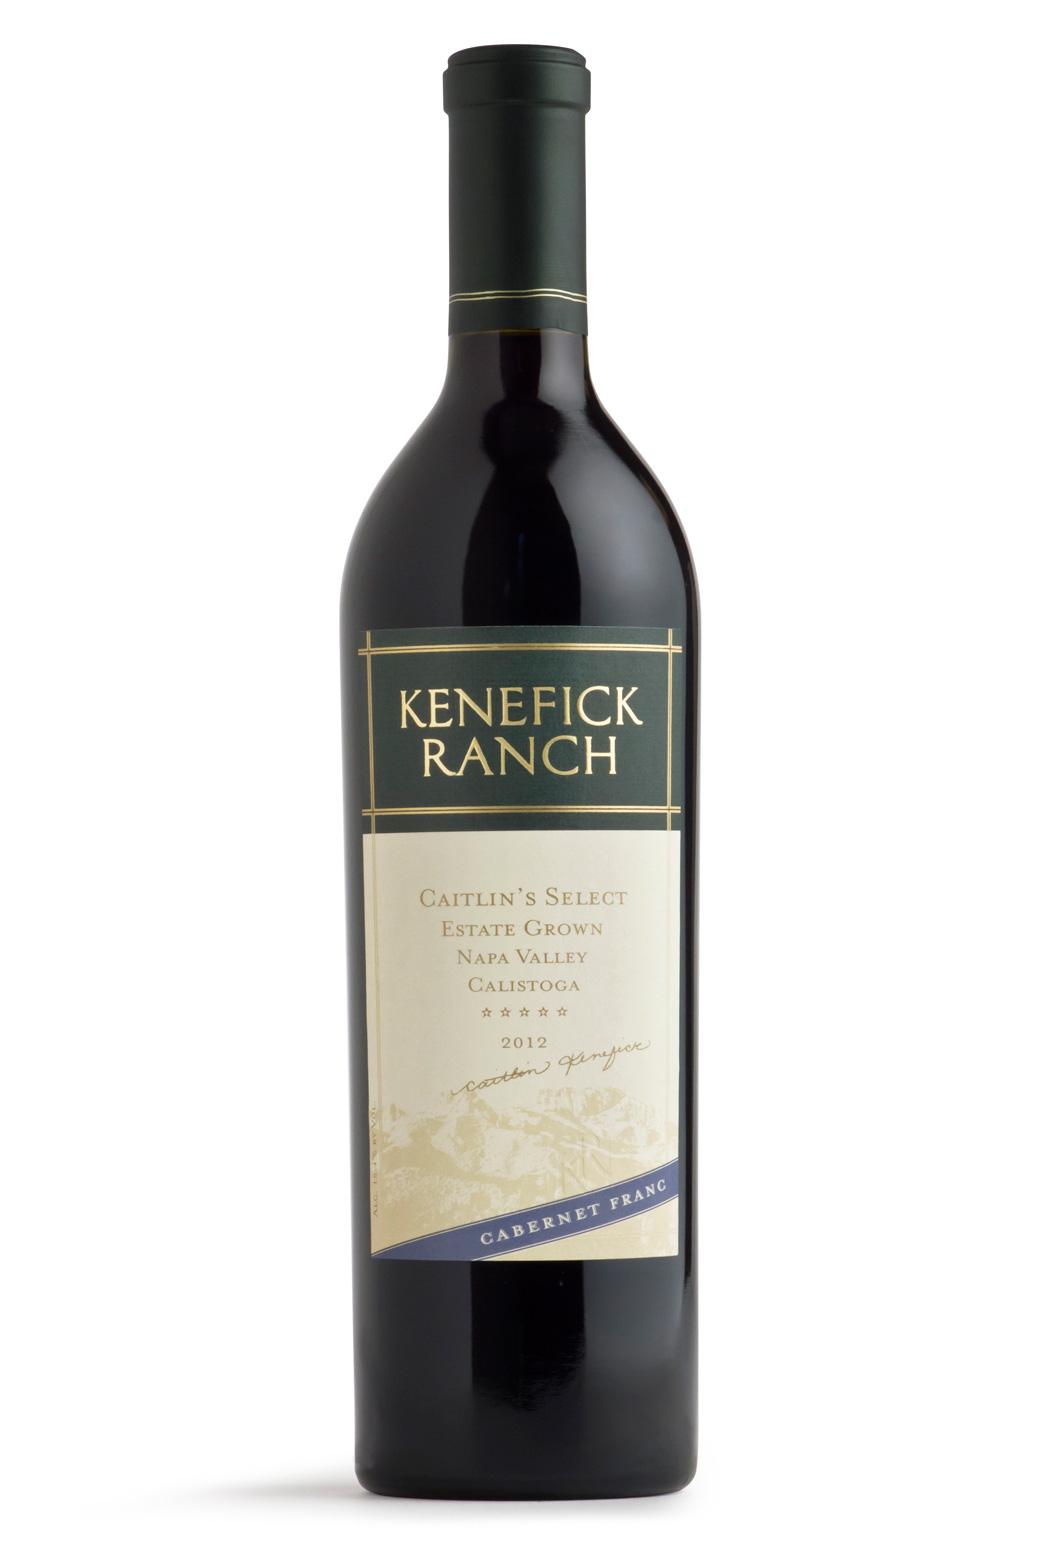 2012 Kenefick Ranch Caitlins Cabernet Franc 750ml